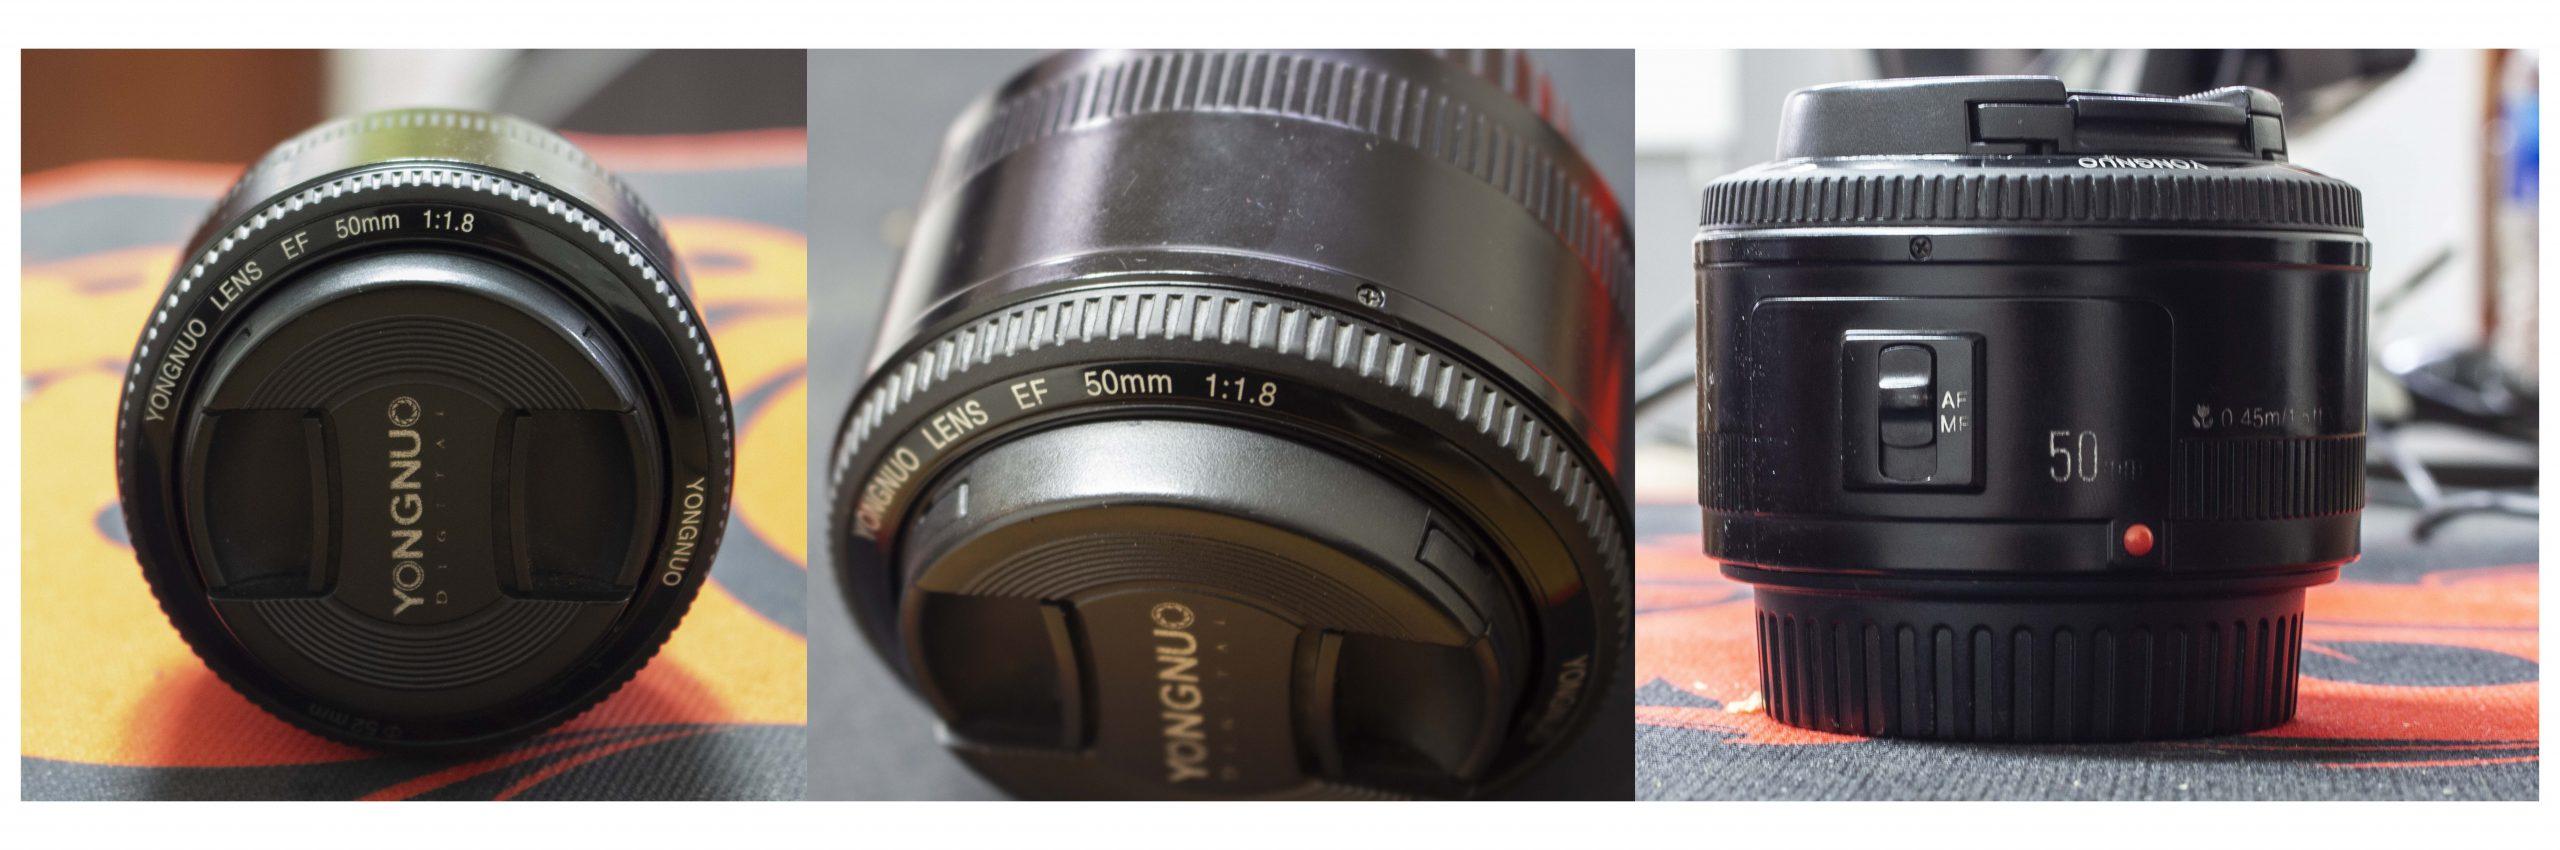 Chiếc lens fix giá rẻ Youngou 50mm f1.8